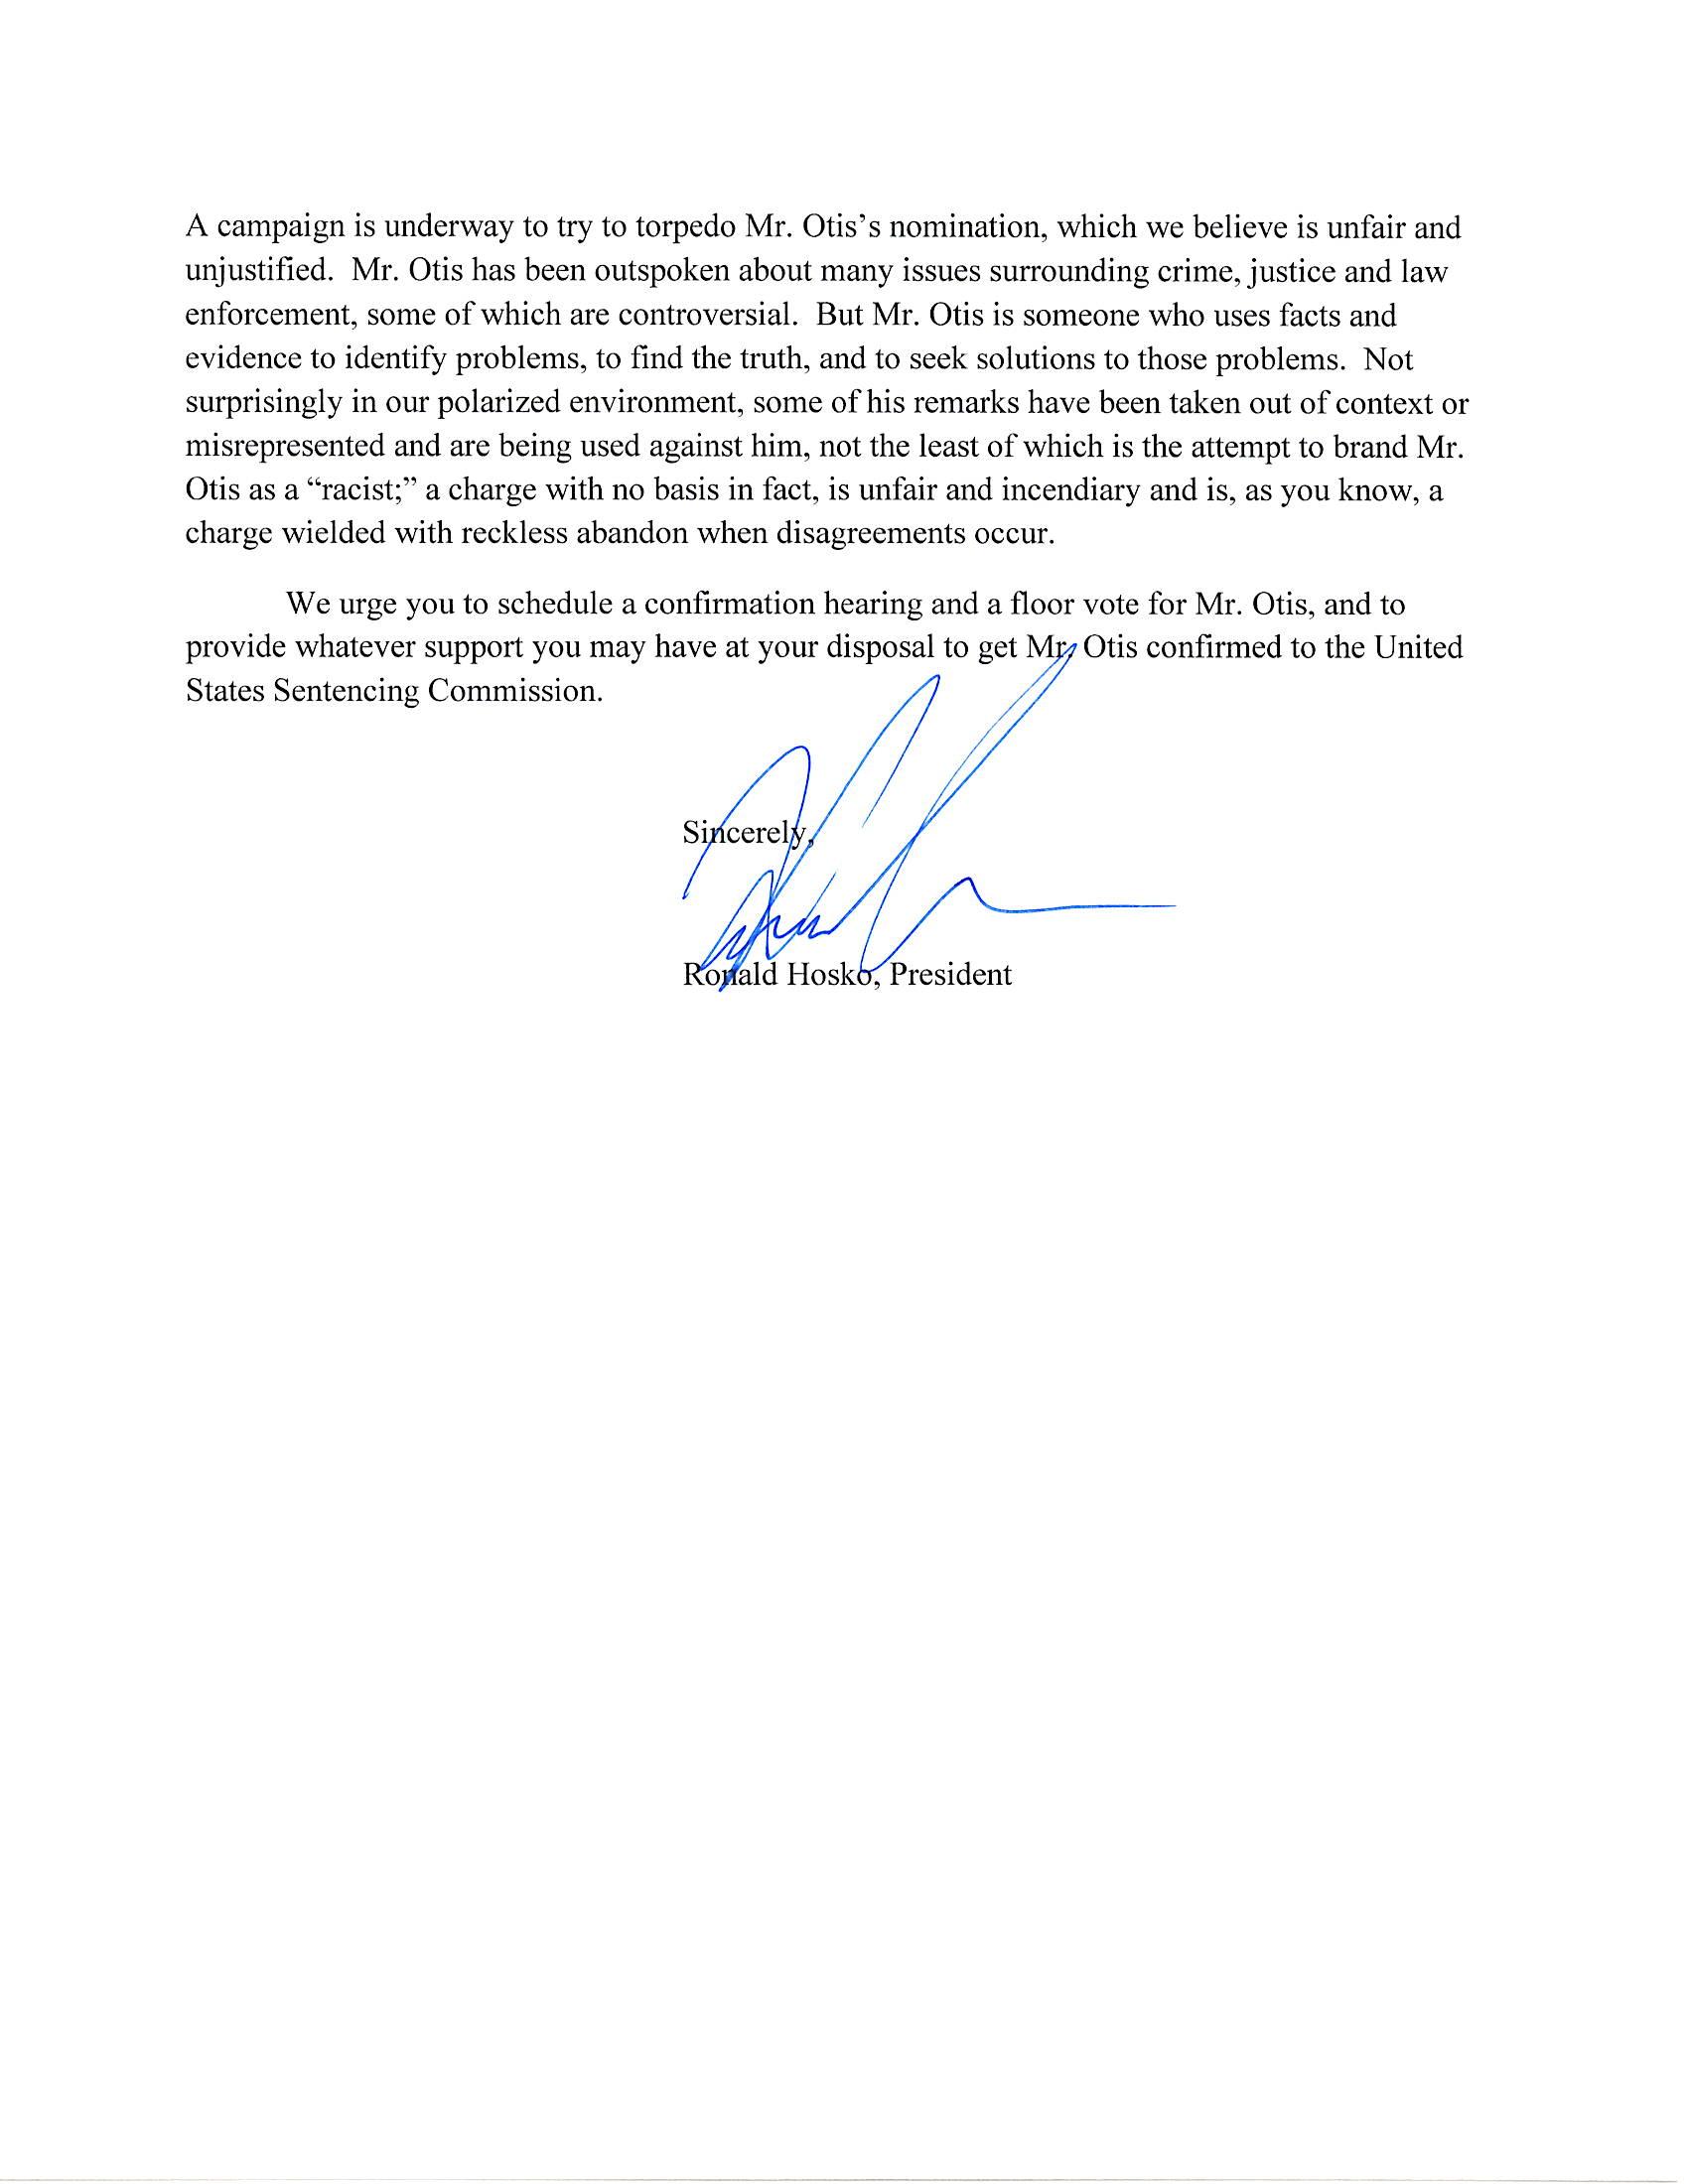 Chuck Schumer Letter